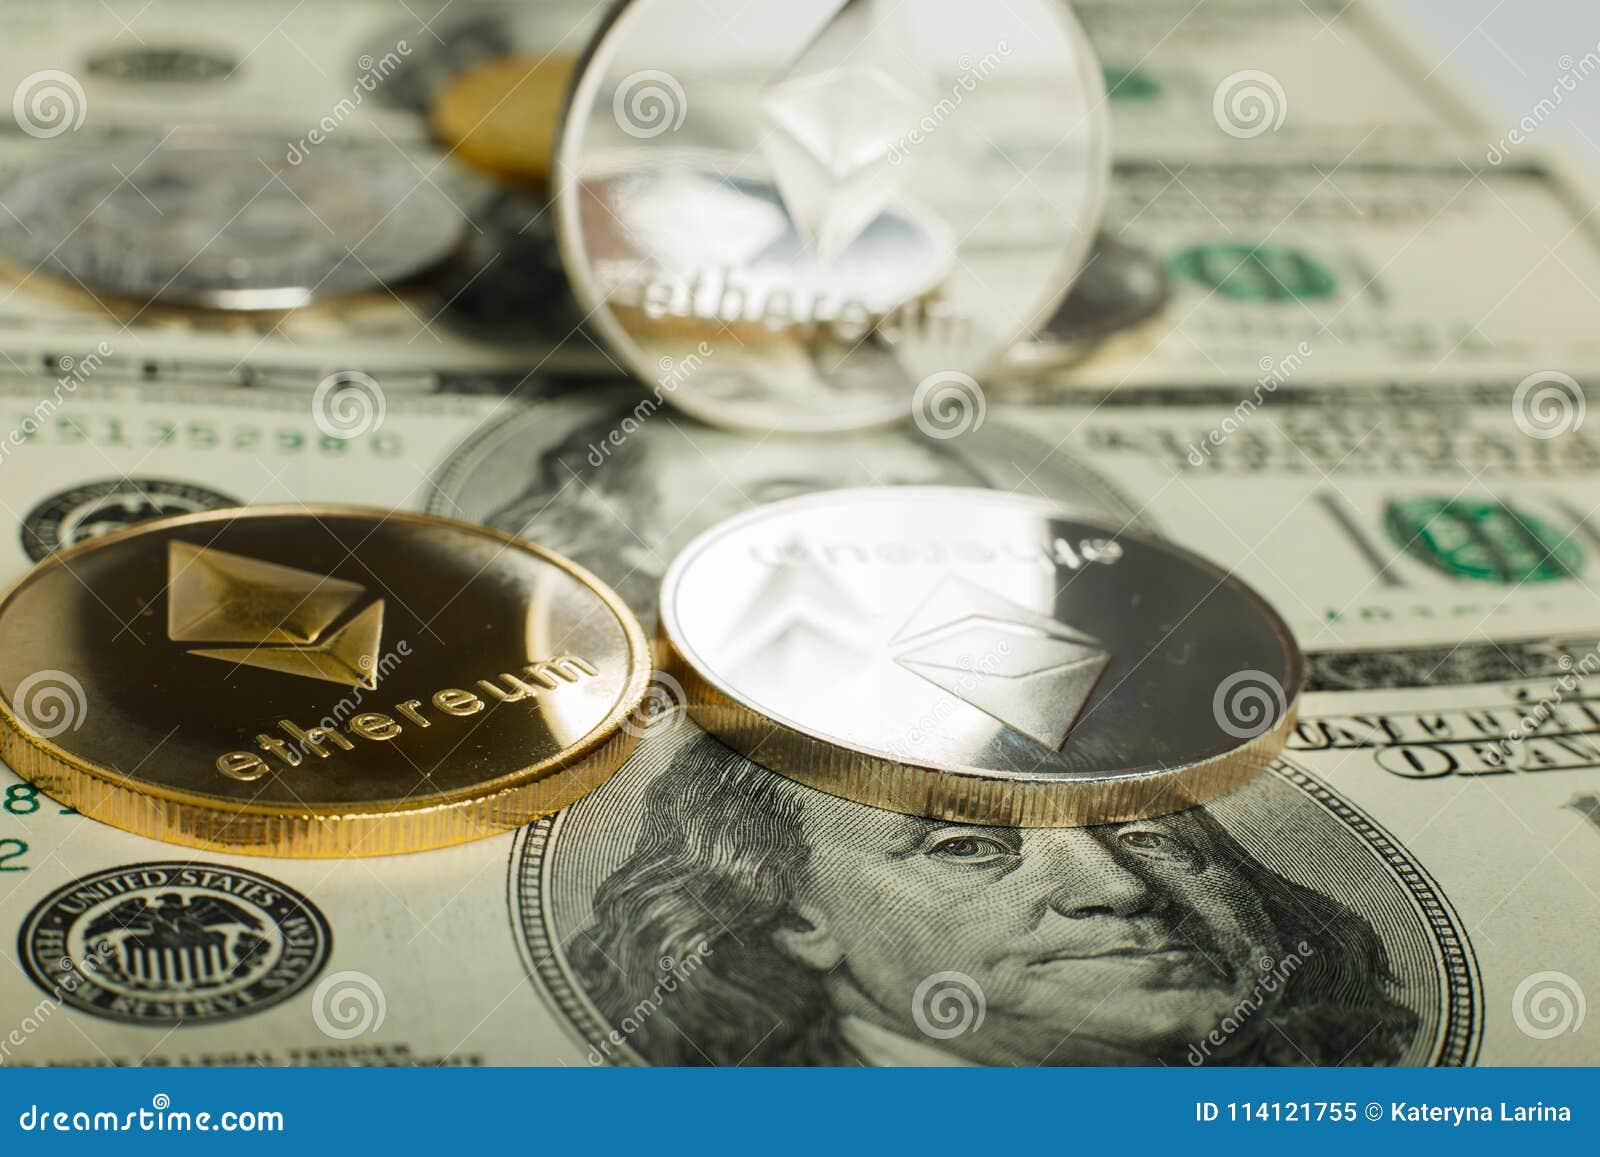 与其他cryptocurrency的Ethereum硬币在美元笔记